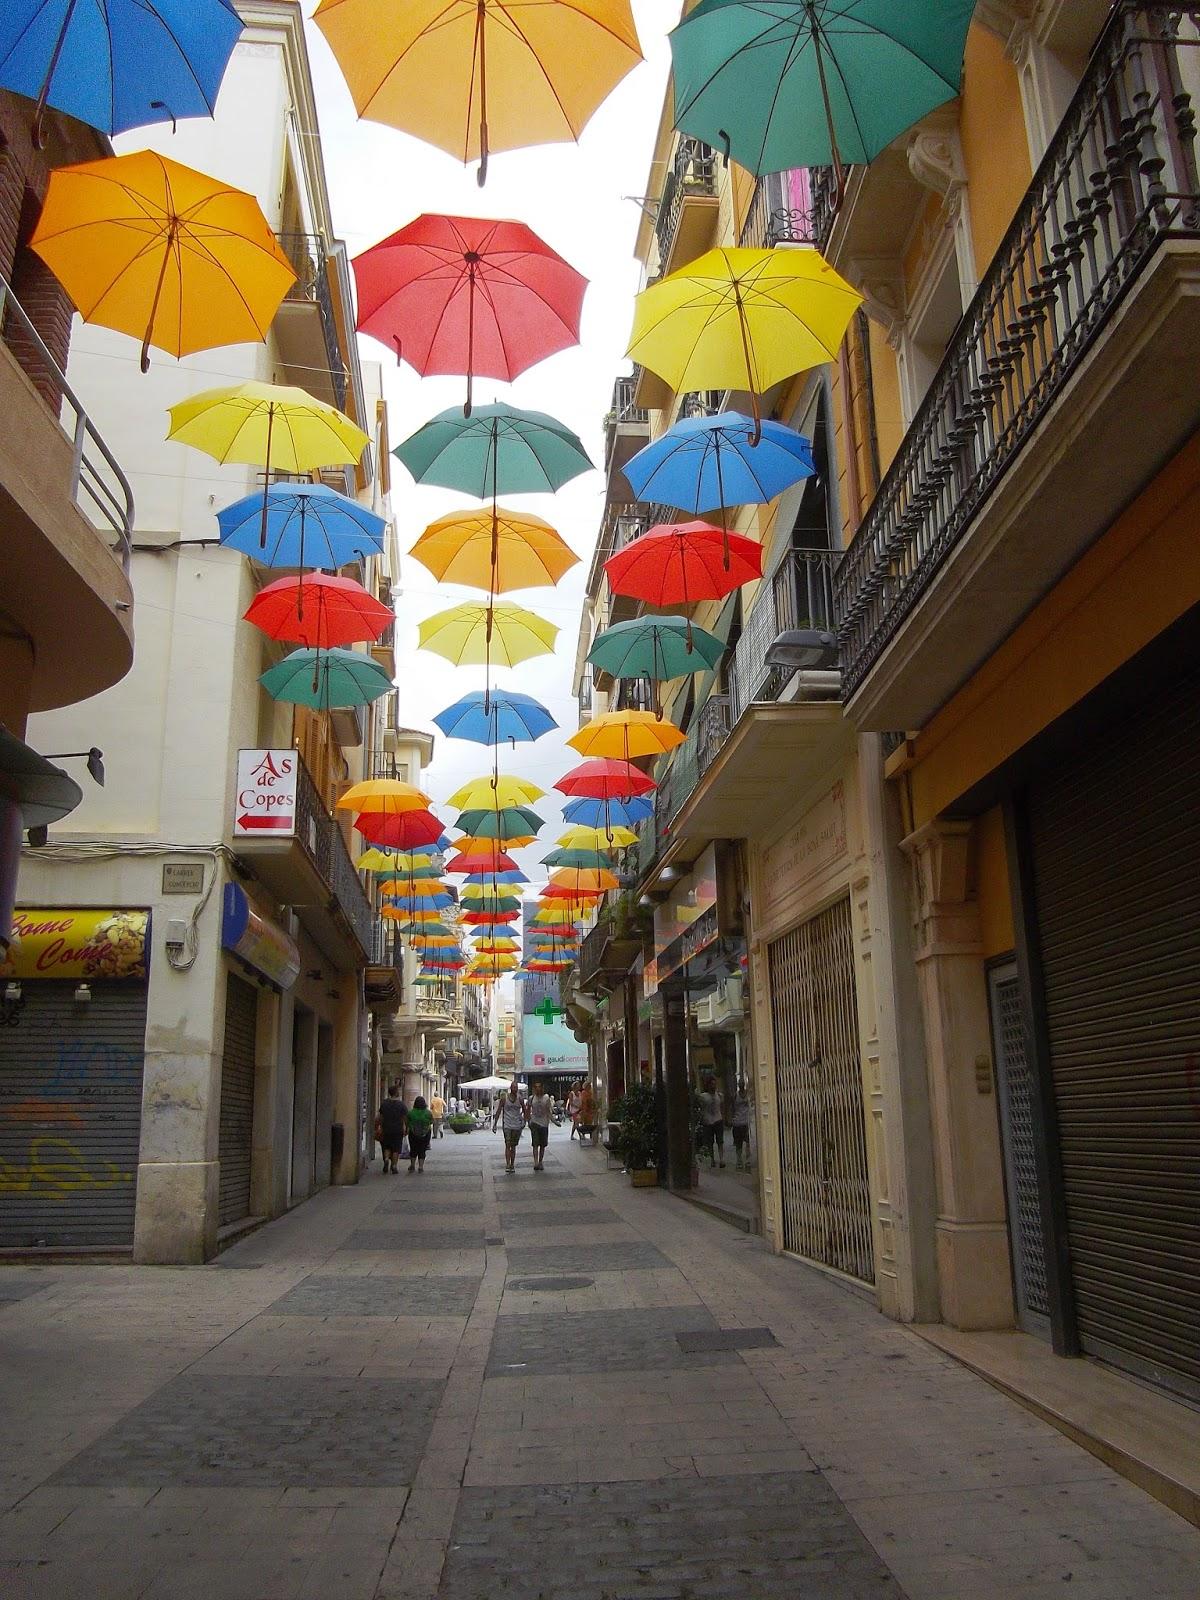 Reus Spain  city photos gallery : Trip to Reus, Spain | Life in Luxembourg